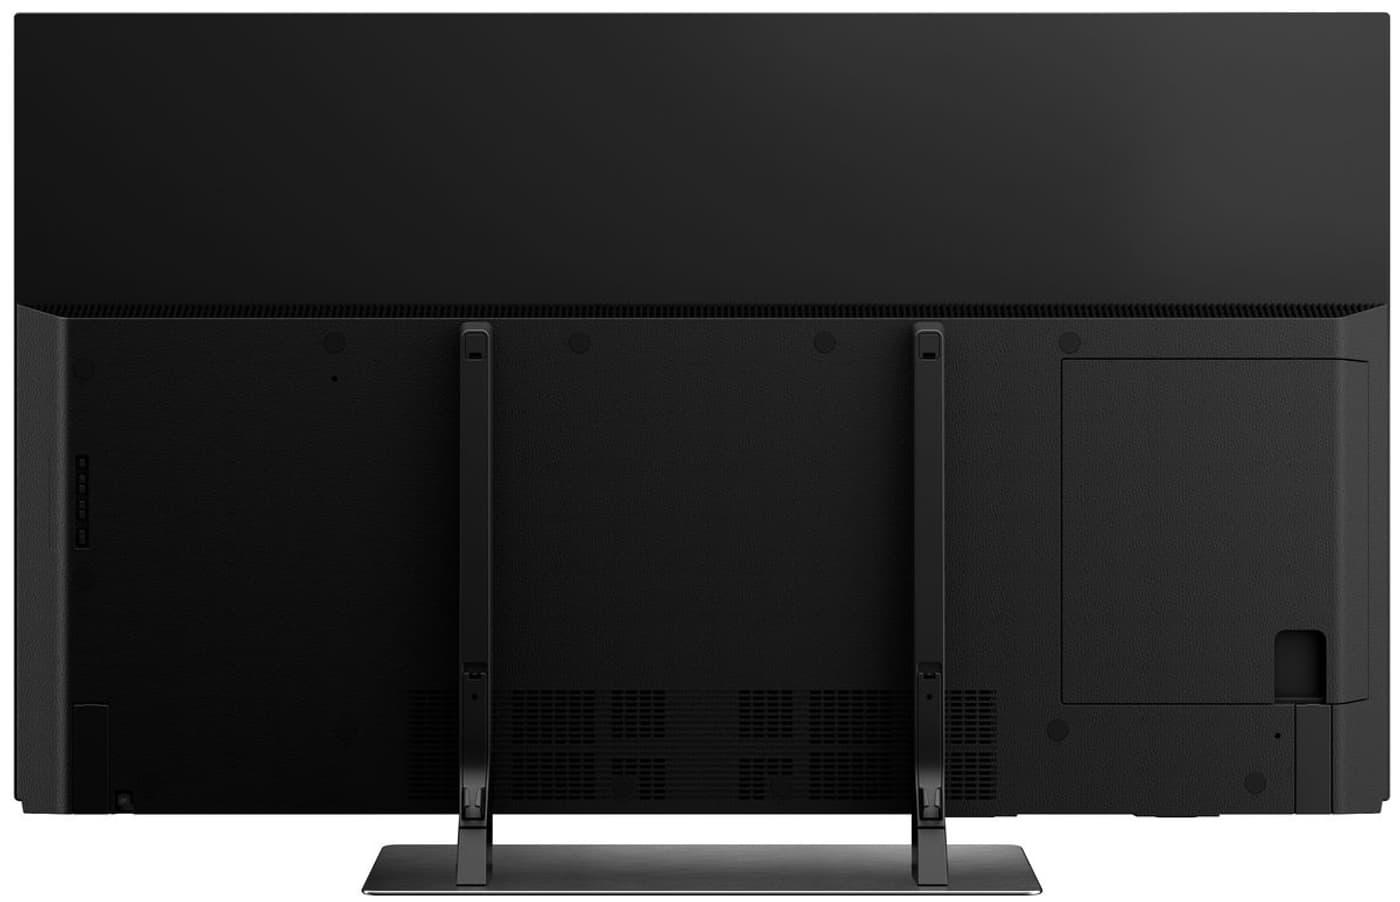 panasonic tx 55ezc954 139 cm 4k oled tv migros. Black Bedroom Furniture Sets. Home Design Ideas